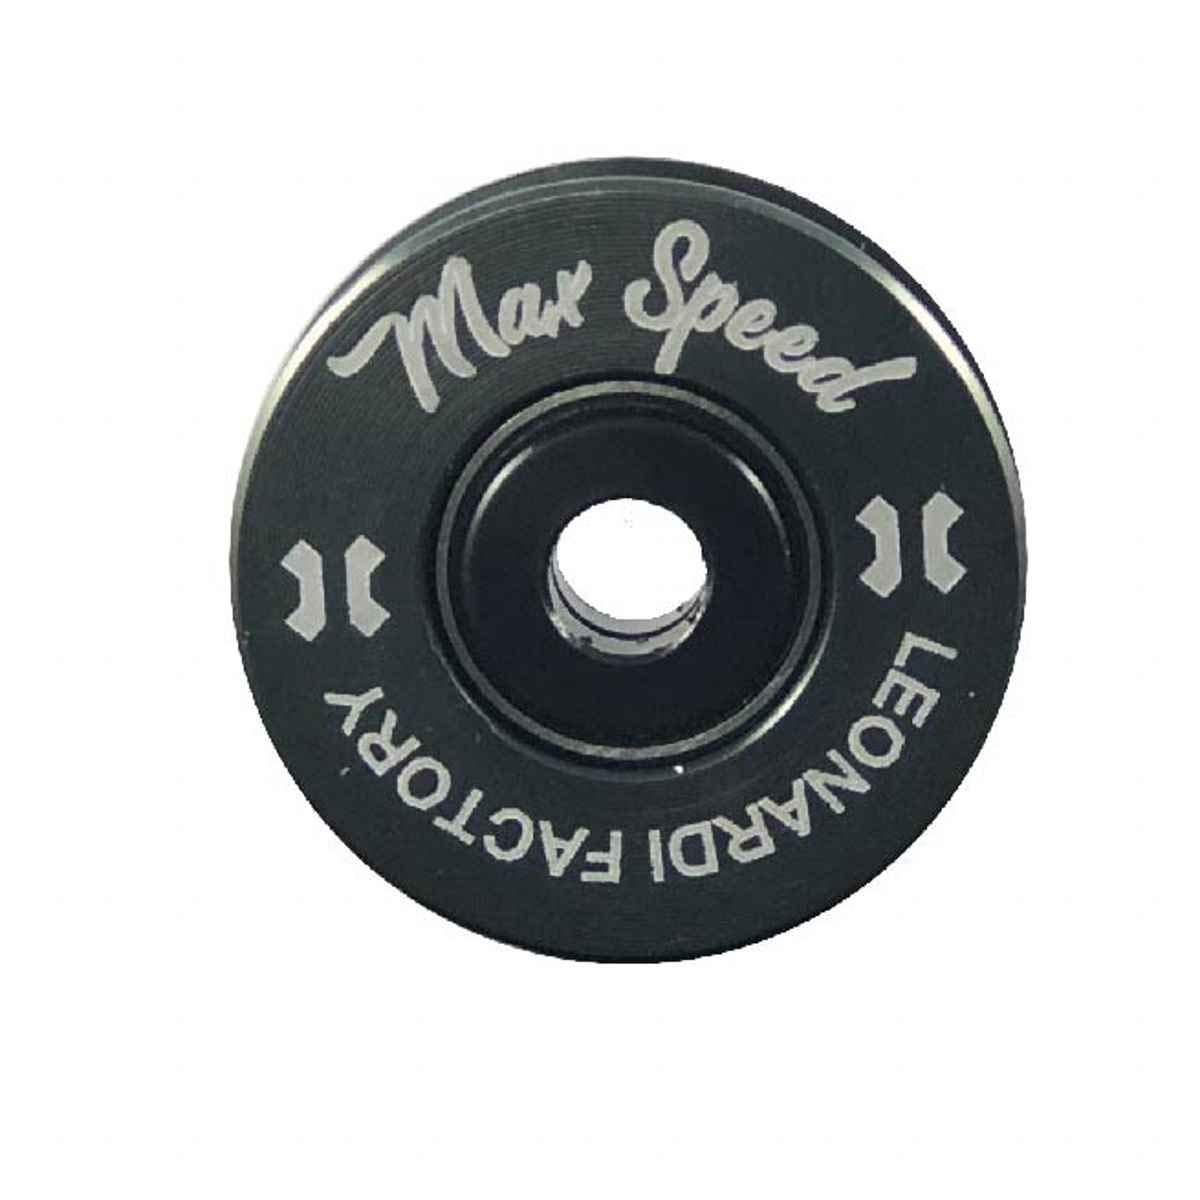 Leonardi Factory Roldana Max Speed Compatible Sram 11-12v Negro